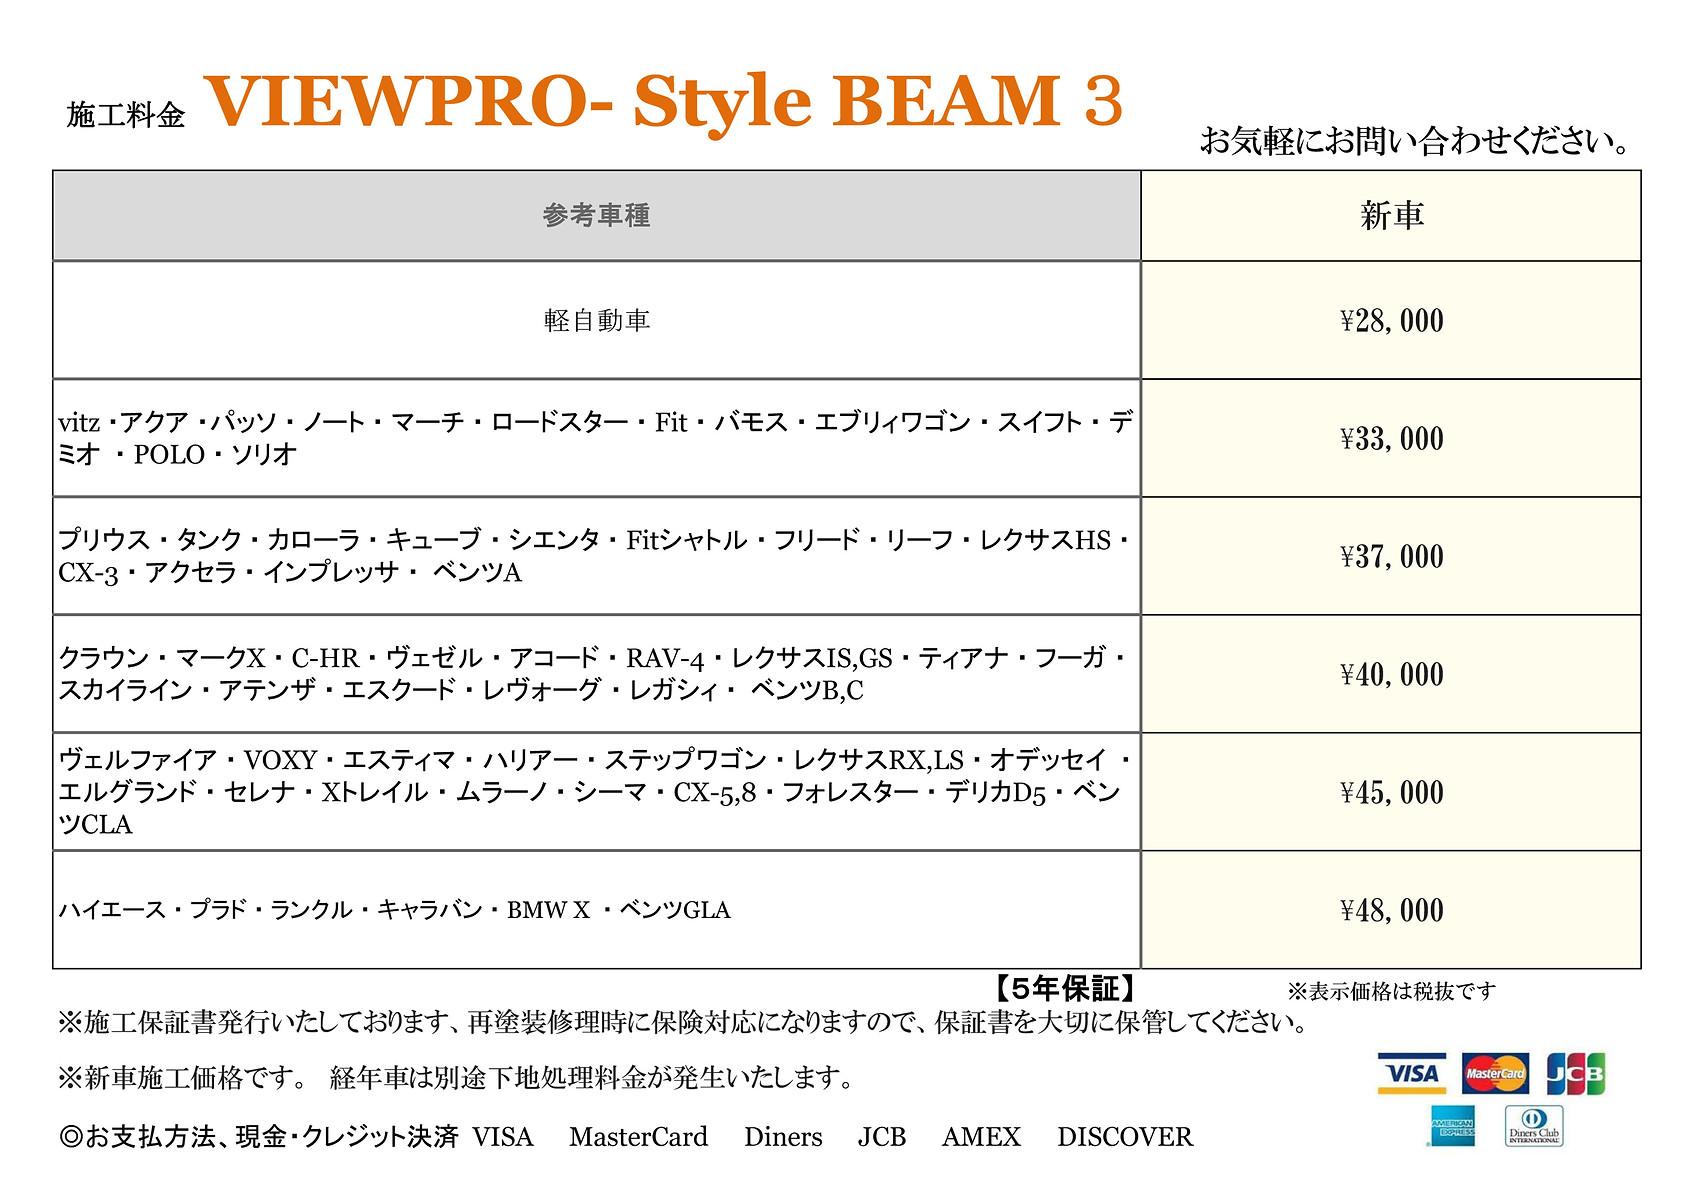 PRO3価格表ウェブサイト用.jpg